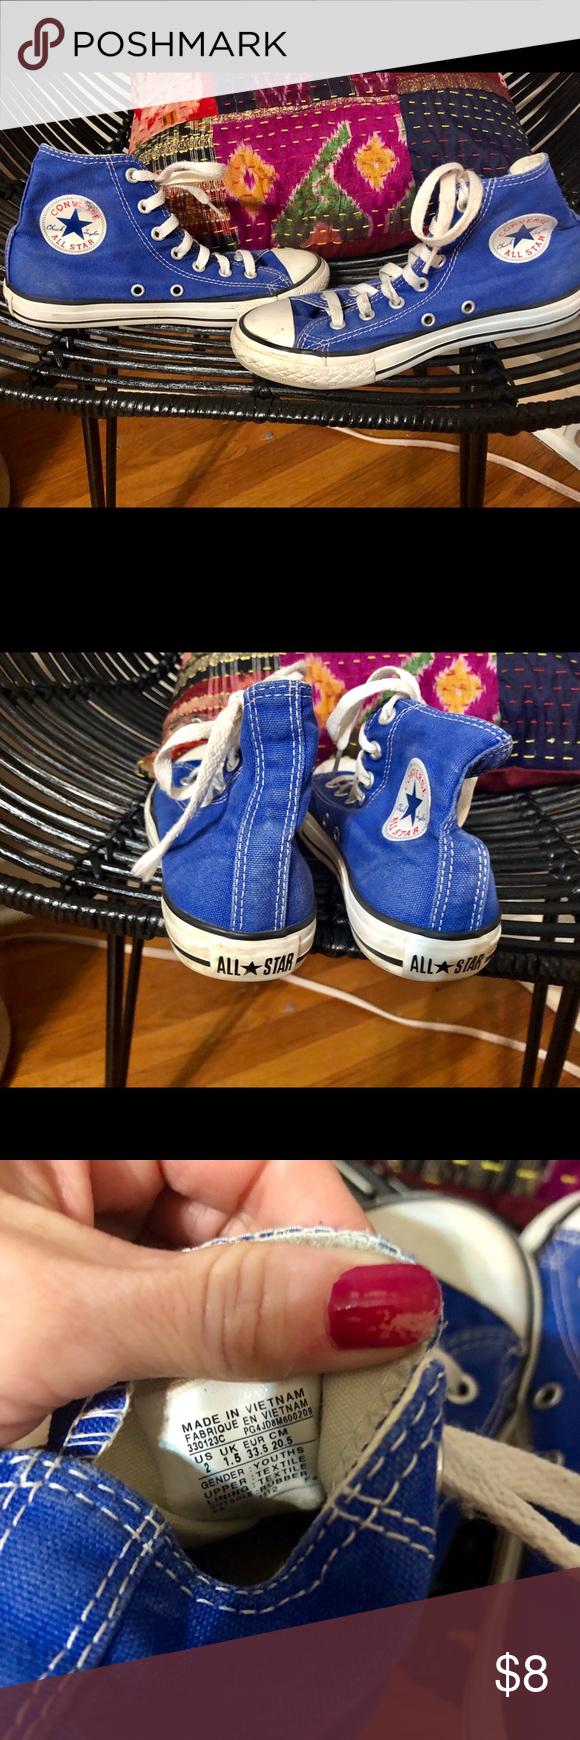 Blue converse high tops Boys blue size